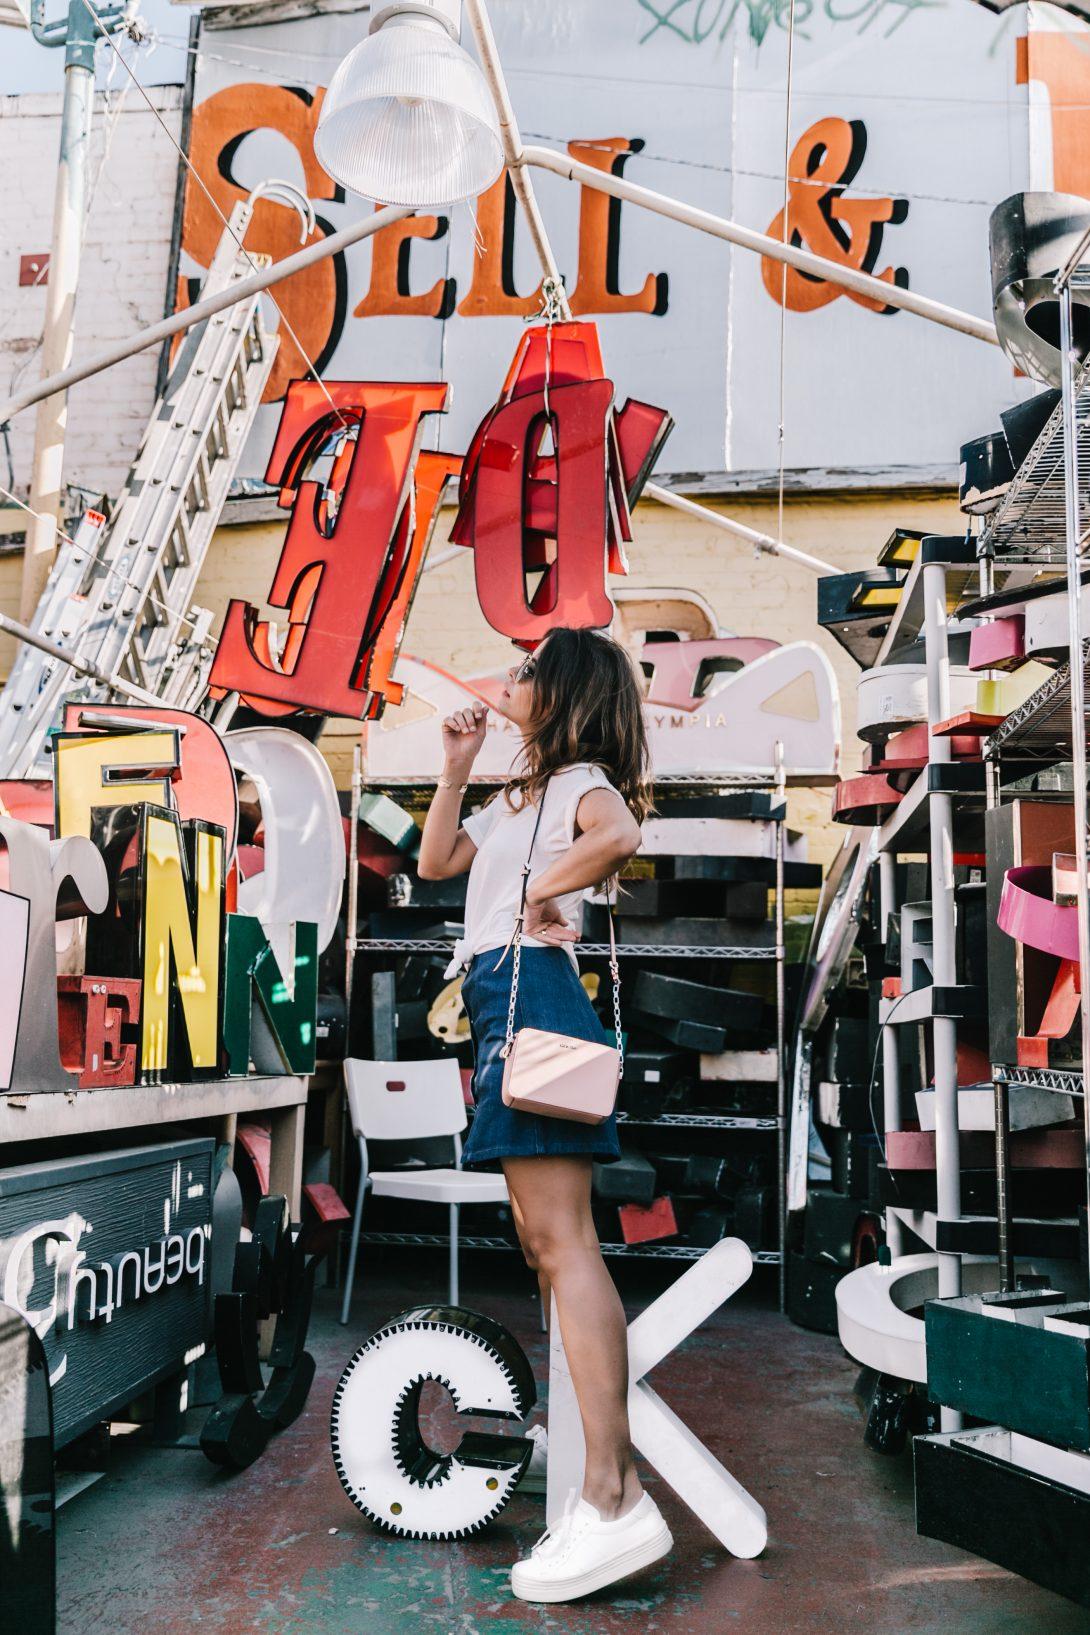 Calvin_Klein-Denim_Skirt-CK_Collection-Los_Angeles-Nick_Metropolis-Saint_Laurent_Sneakers-Pink_Bag-Outfit-Collage_Vintage--39